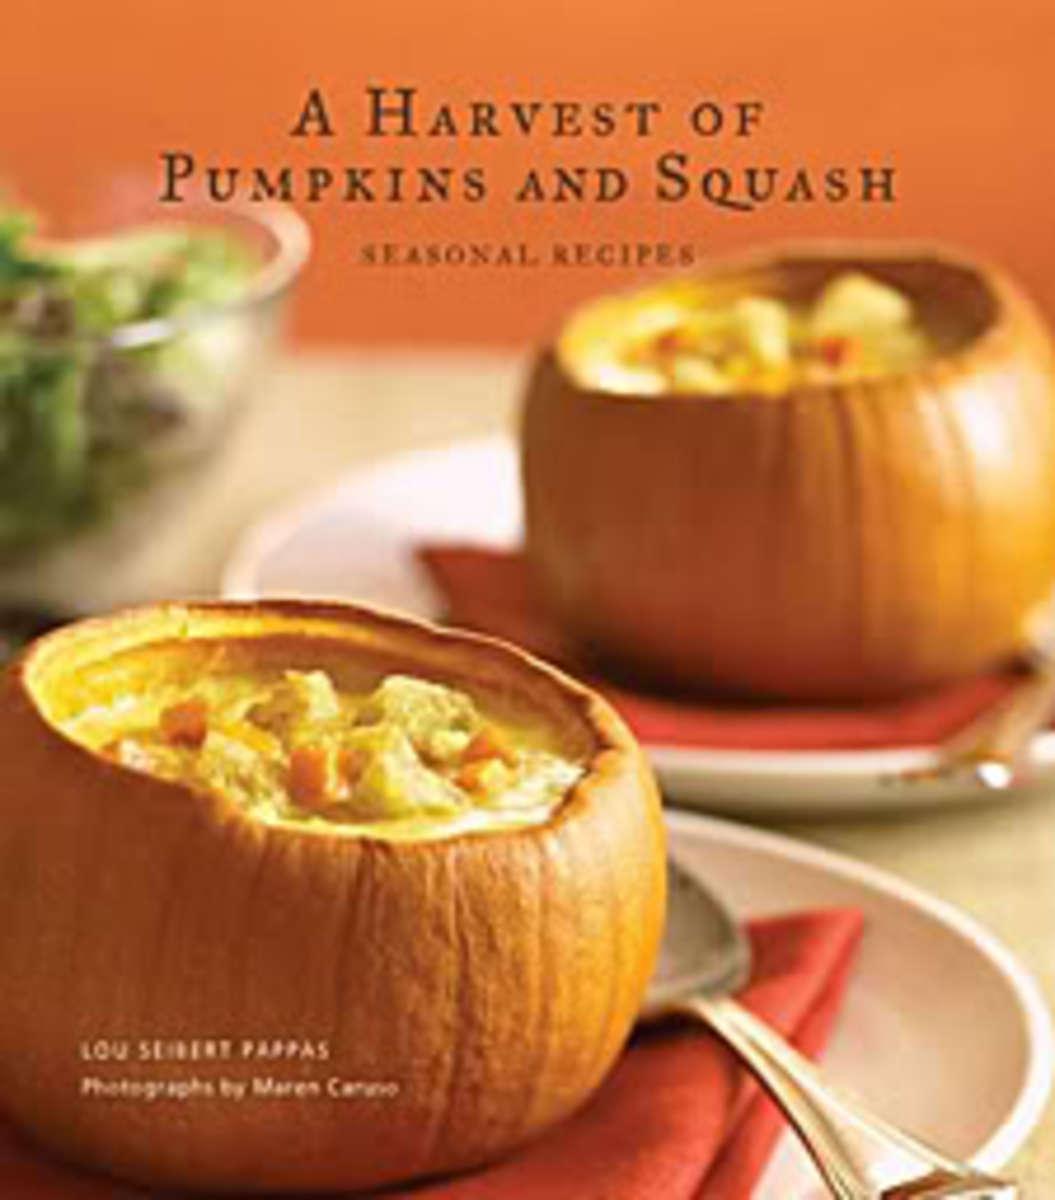 HarvestofPumpkinsandSquash1